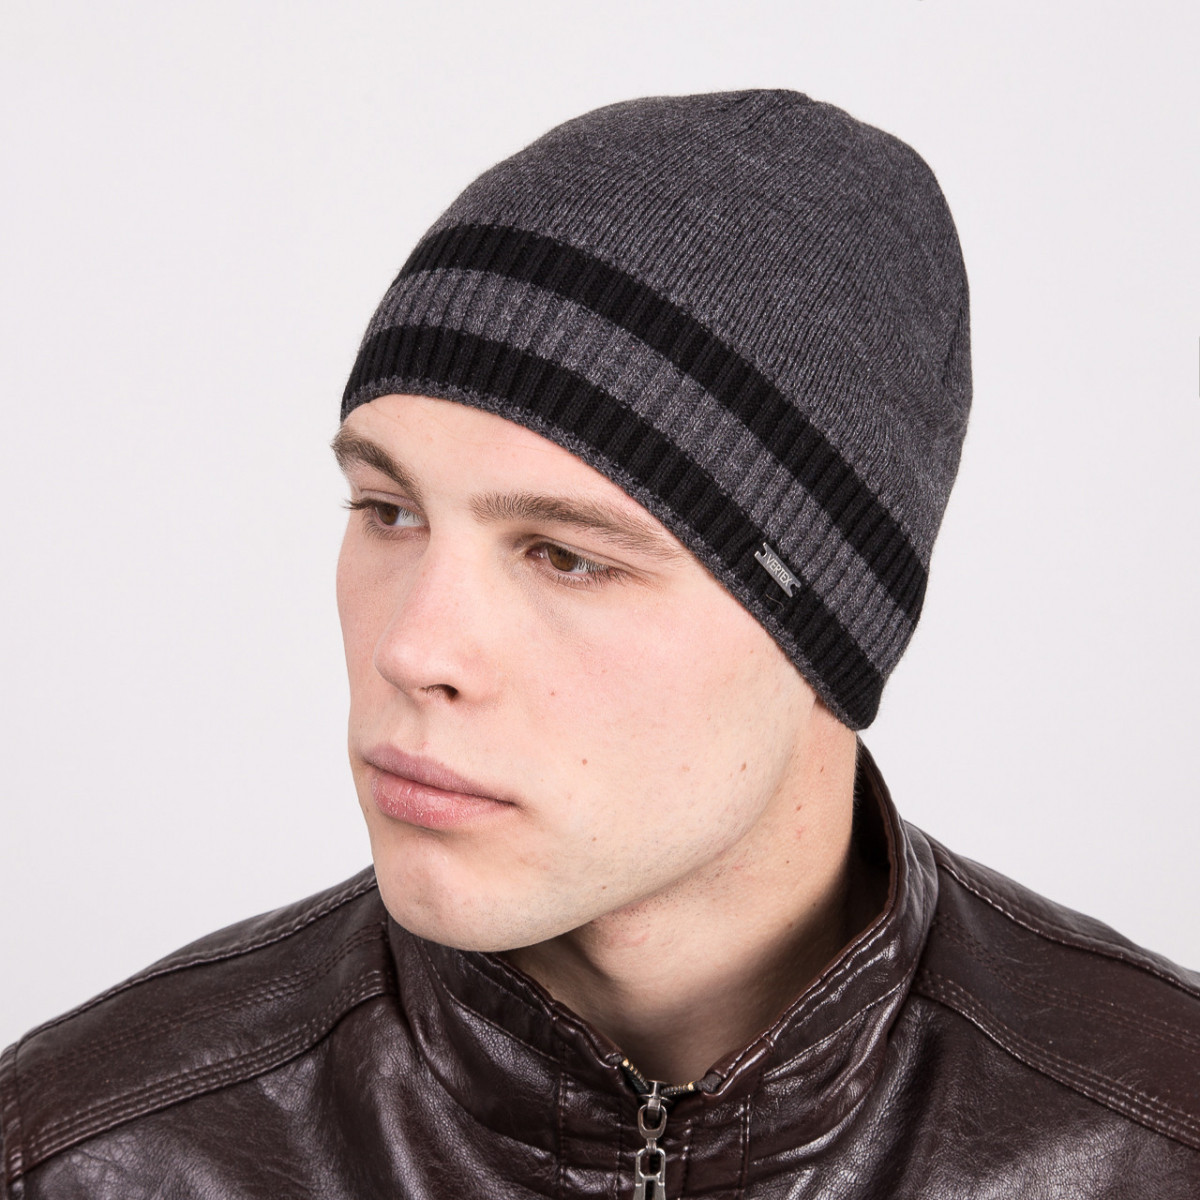 Мужская стильная вязаная шапка в полоску - Артикул m23